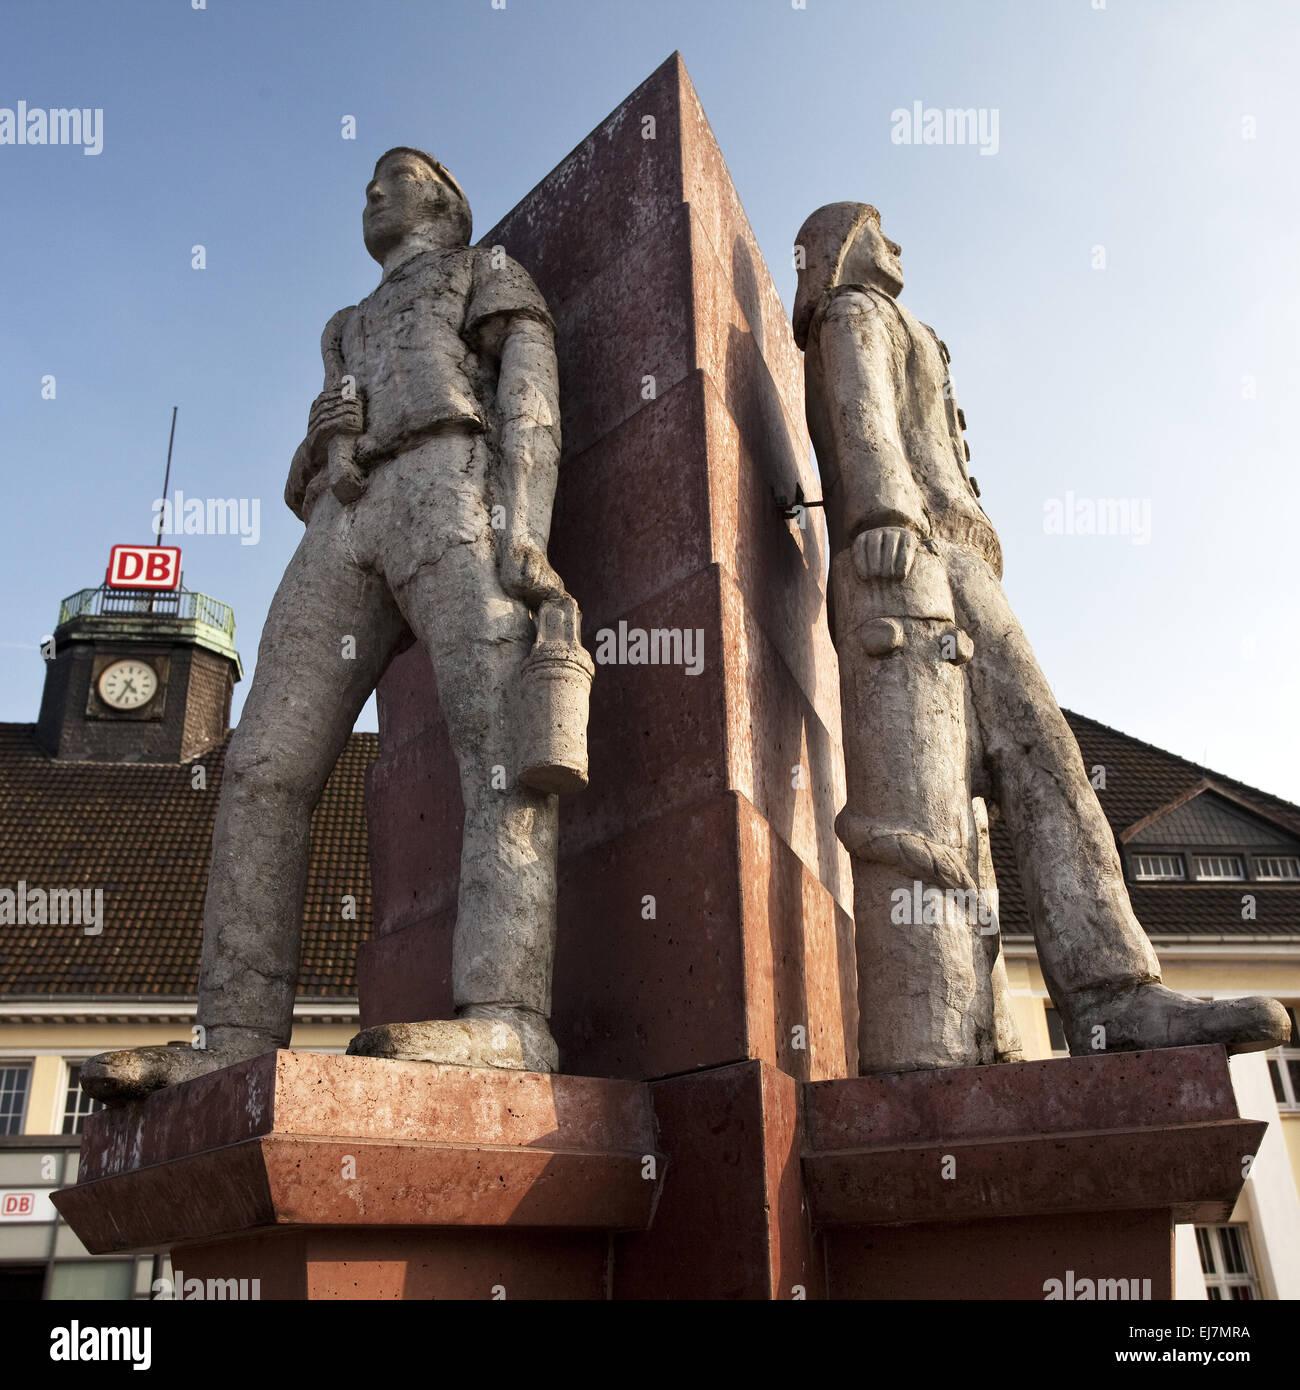 Tres hombres esquina, Herne, Alemania Imagen De Stock